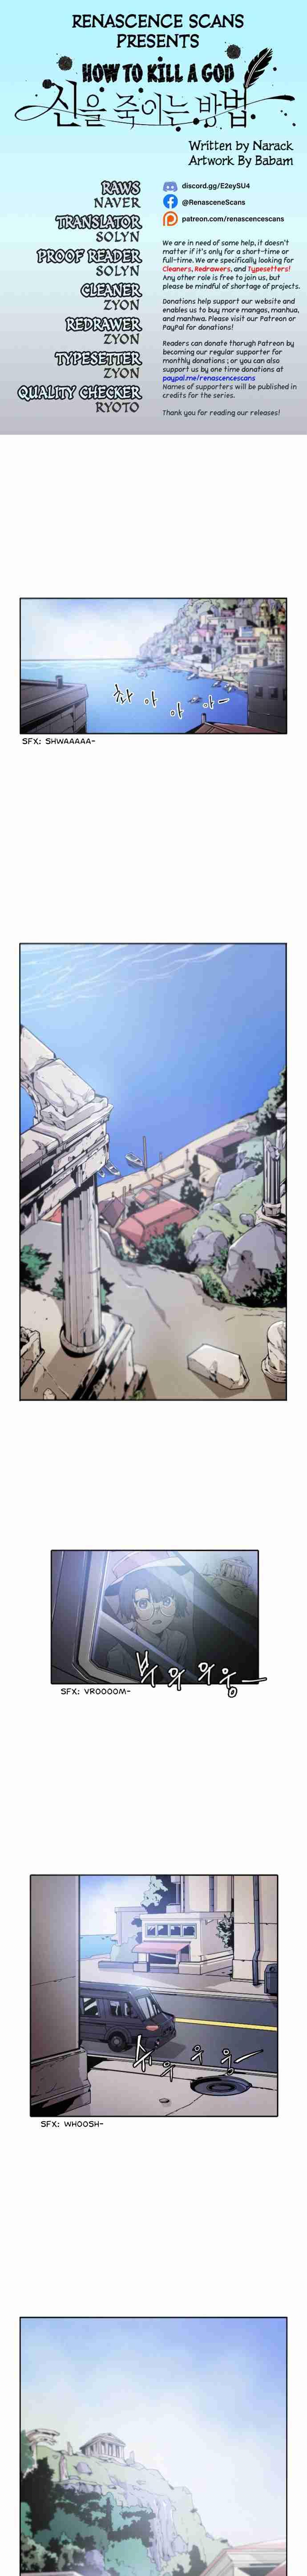 https://img2.nineanime.com/comics/pic2/28/24220/722985/621d187a8e1a345cc07422a61c669654.jpg Page 1